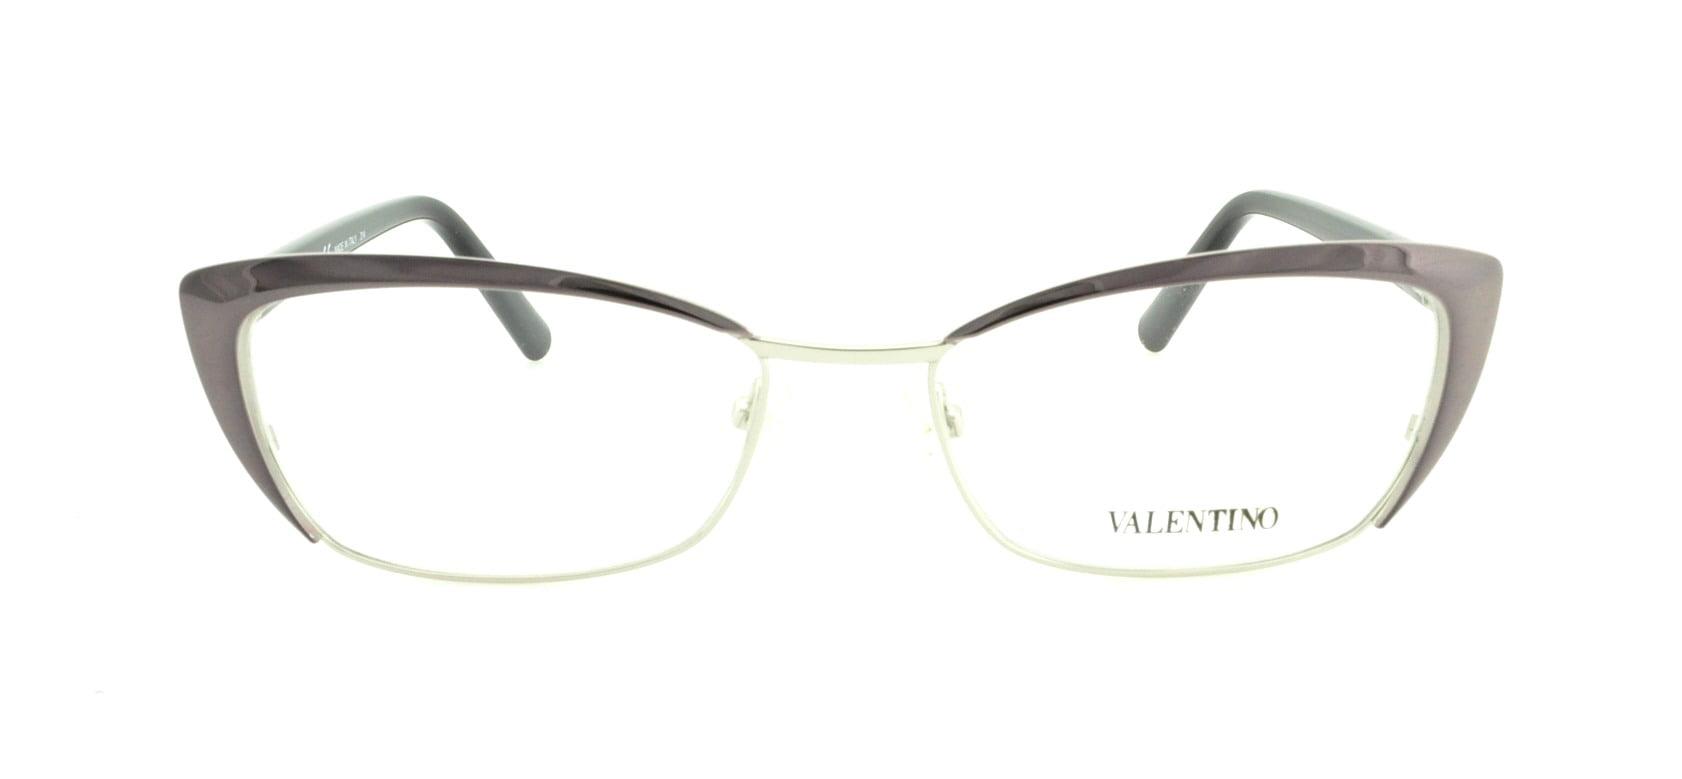 VALENTINO Eyeglasses V2122 060 Gunmetal 52MM - Walmart.com